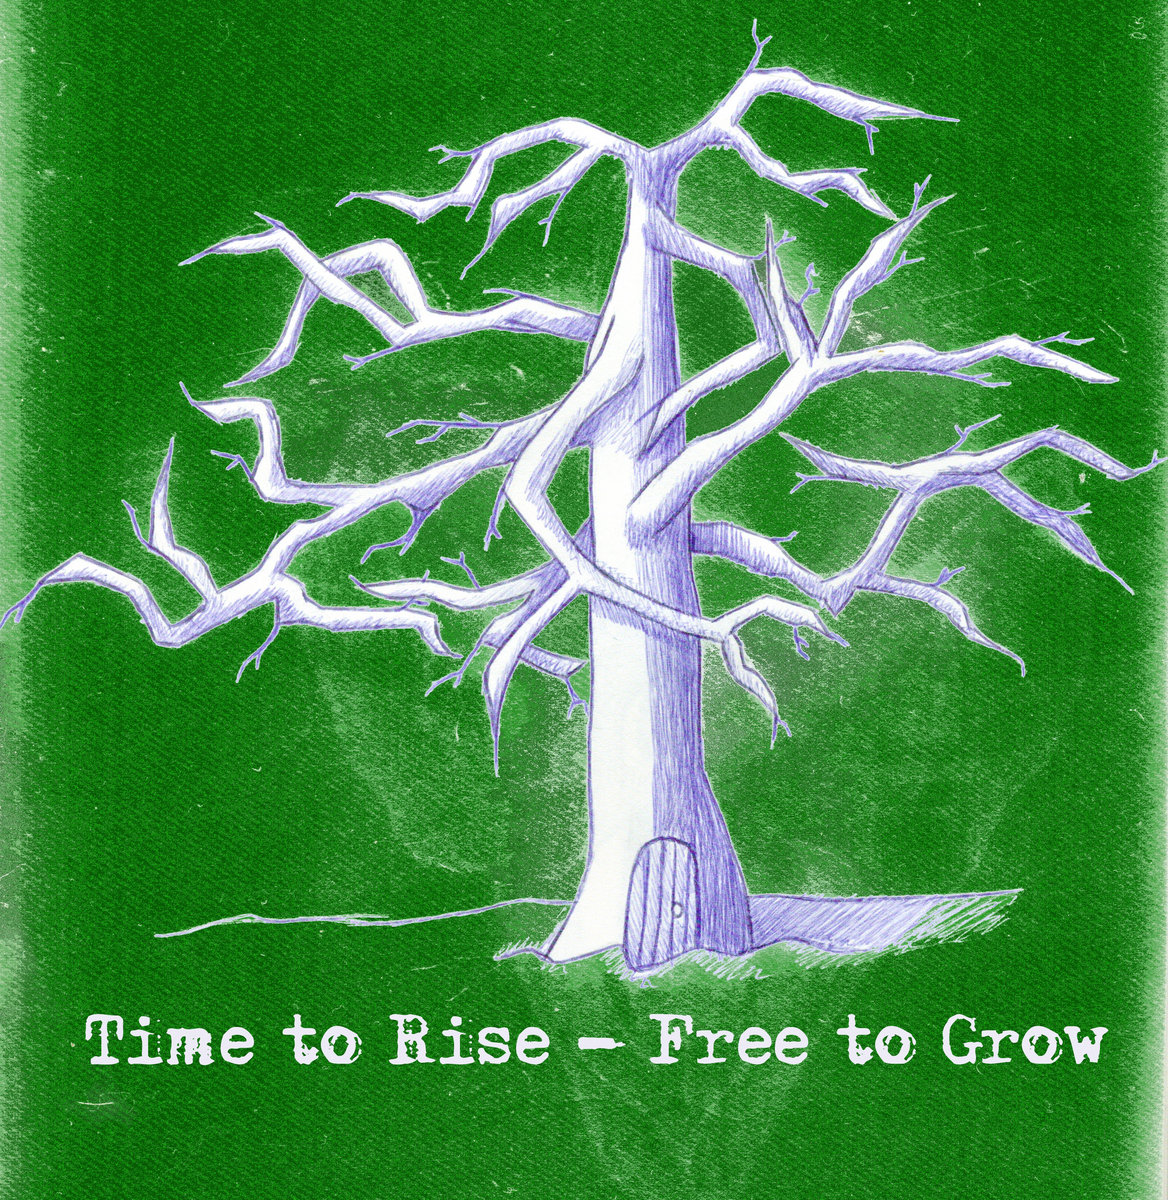 Happy Dance Free To Grow